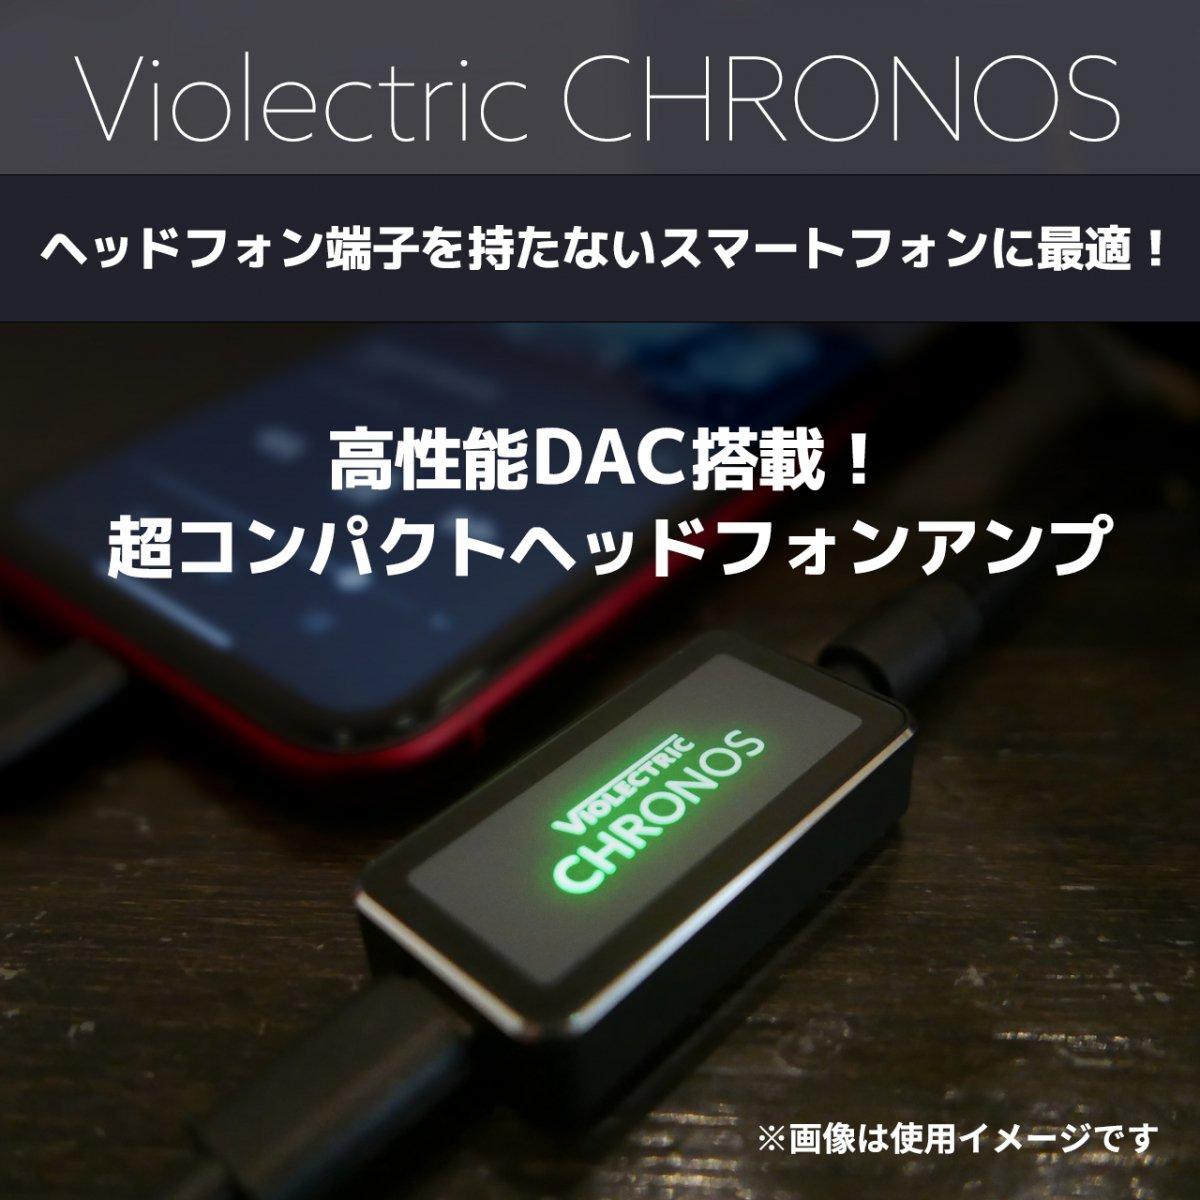 Violectric CHRONOS